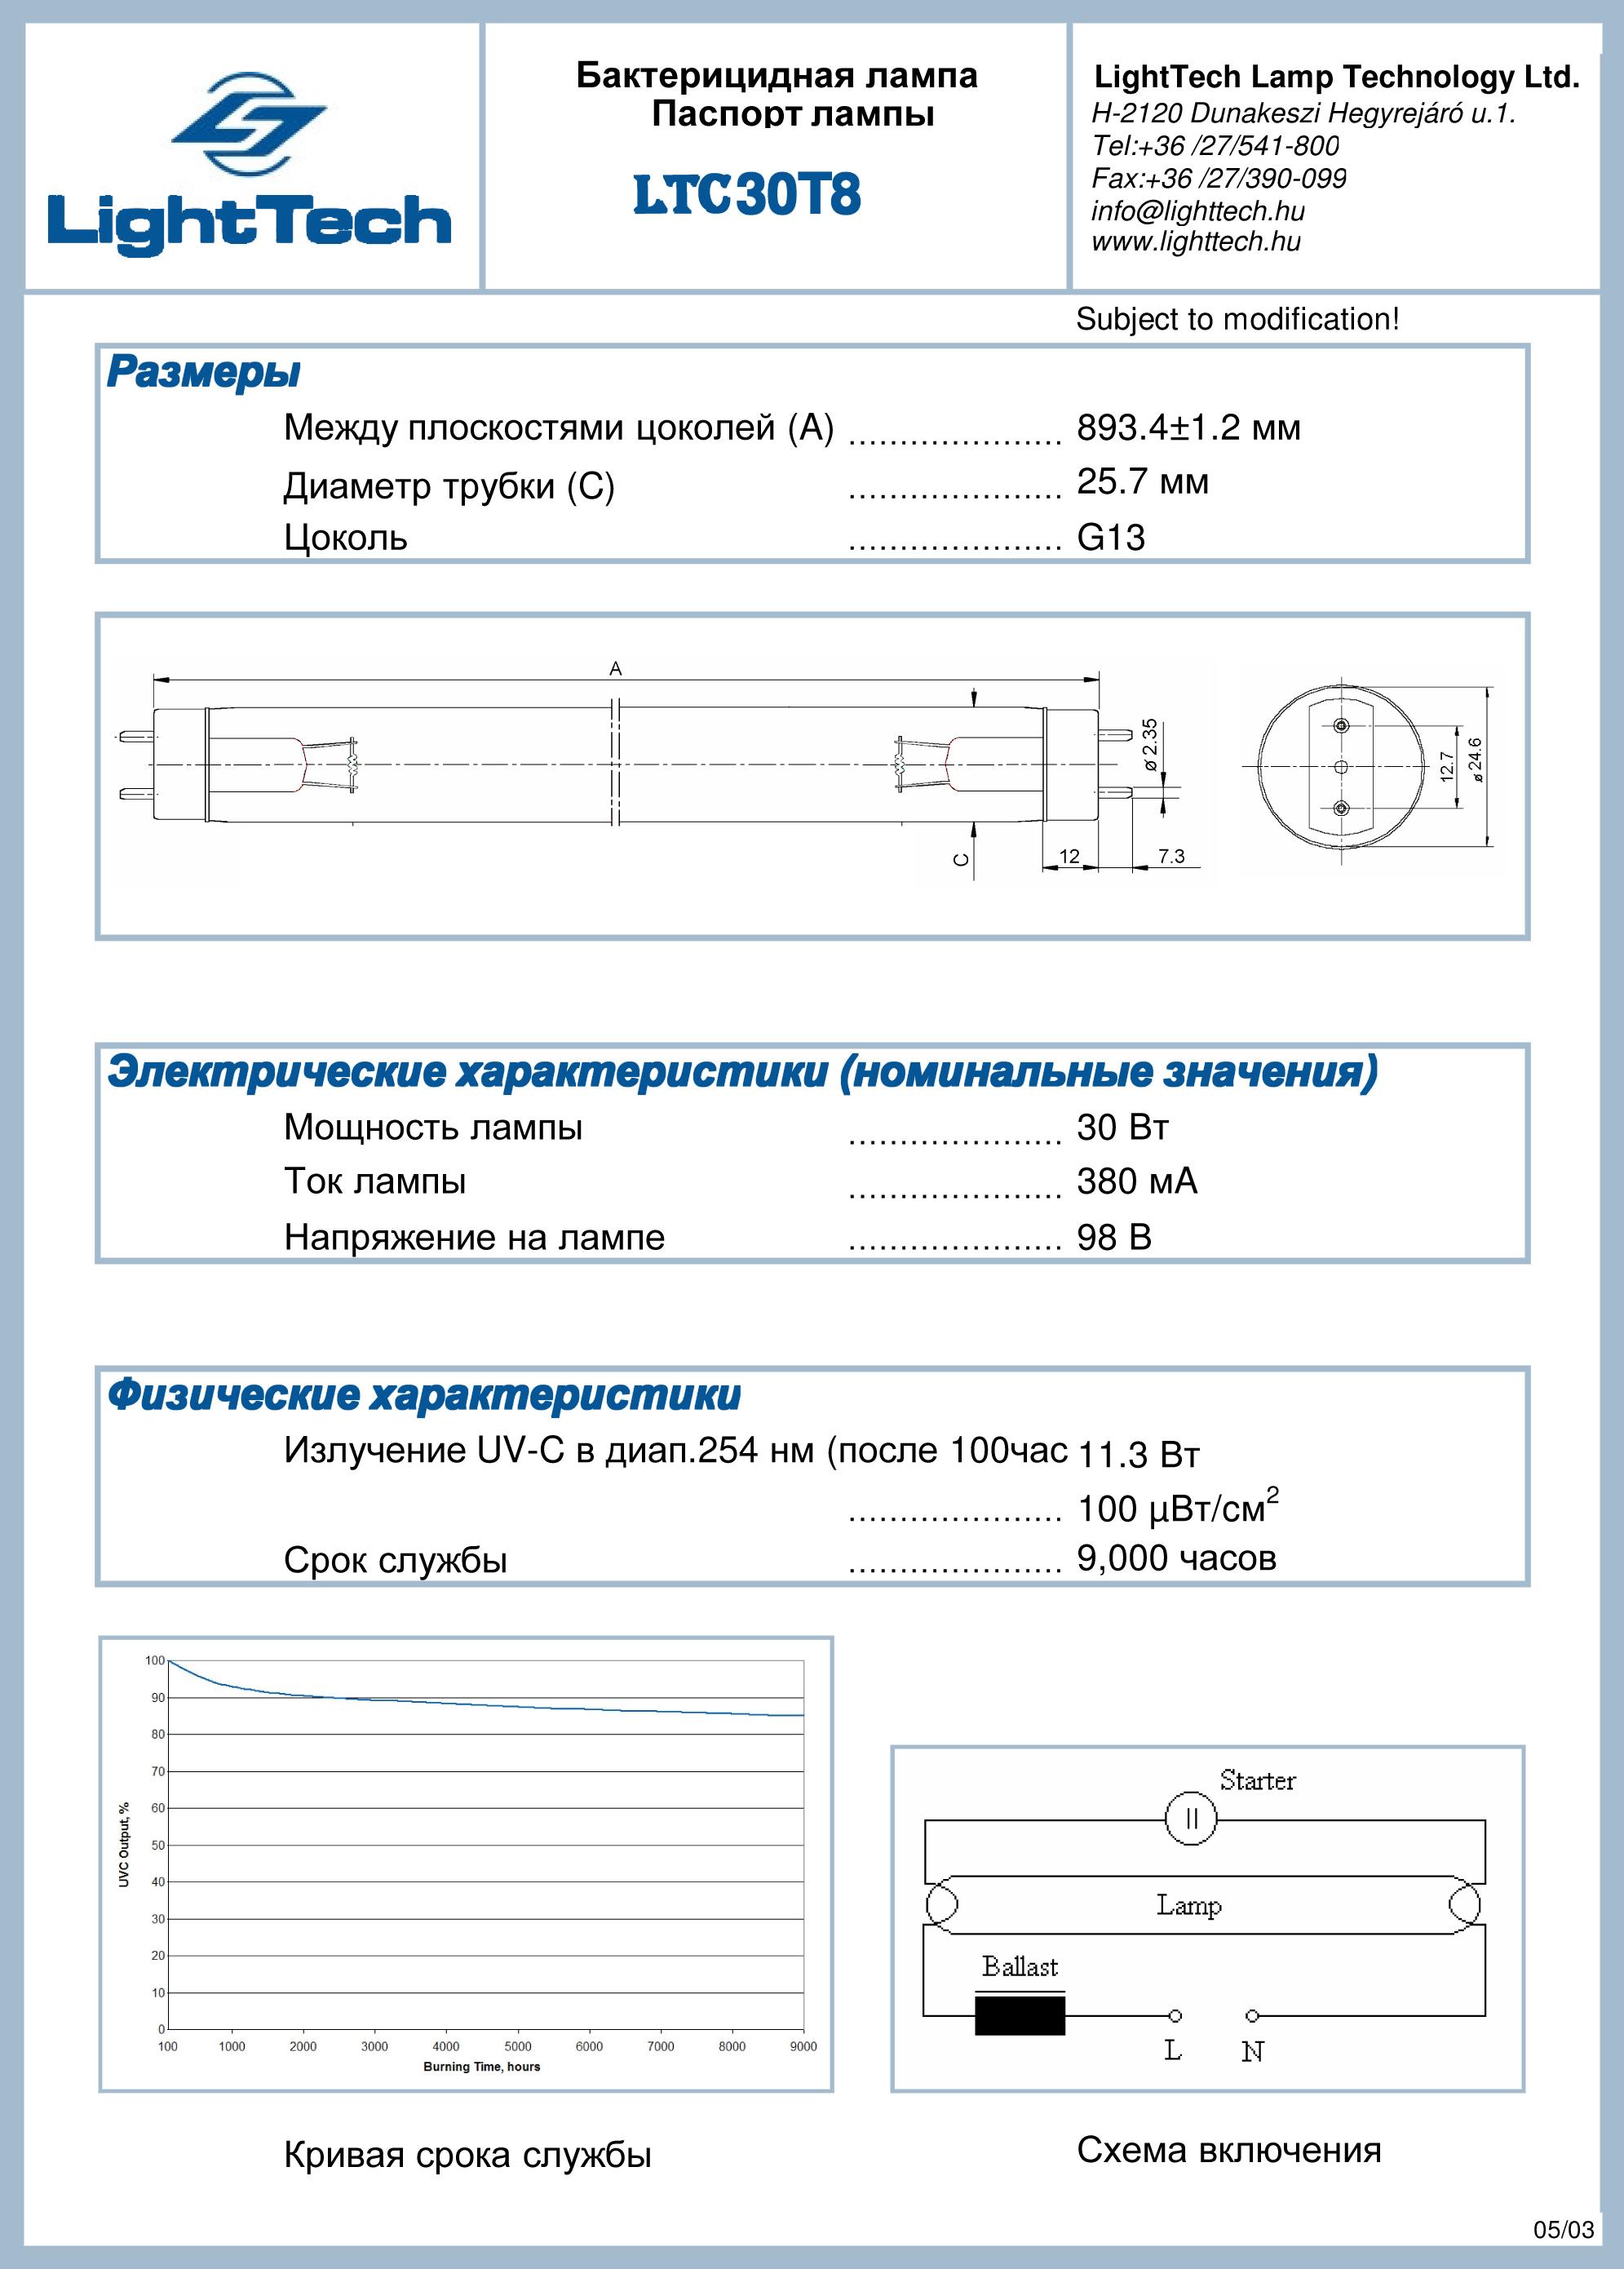 Tuv 30w g30 t8 схема включения